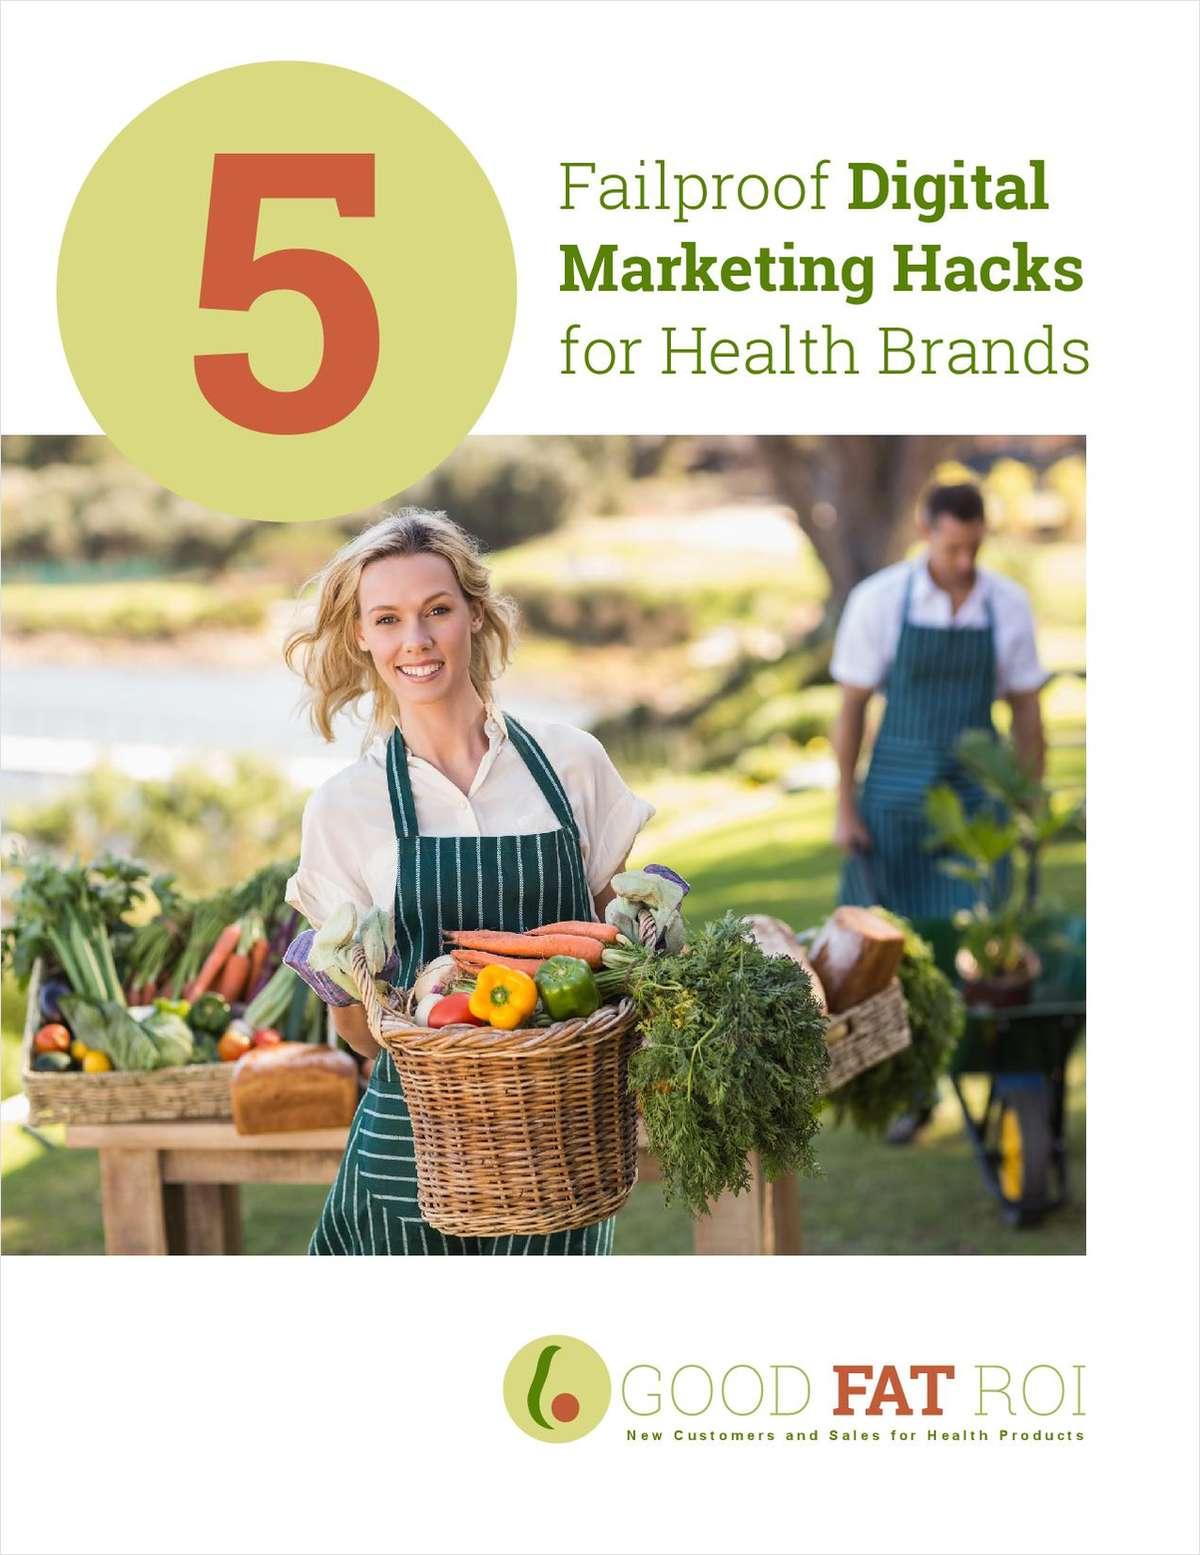 5 Failproof Digital Marketing Hacks for Health Brands